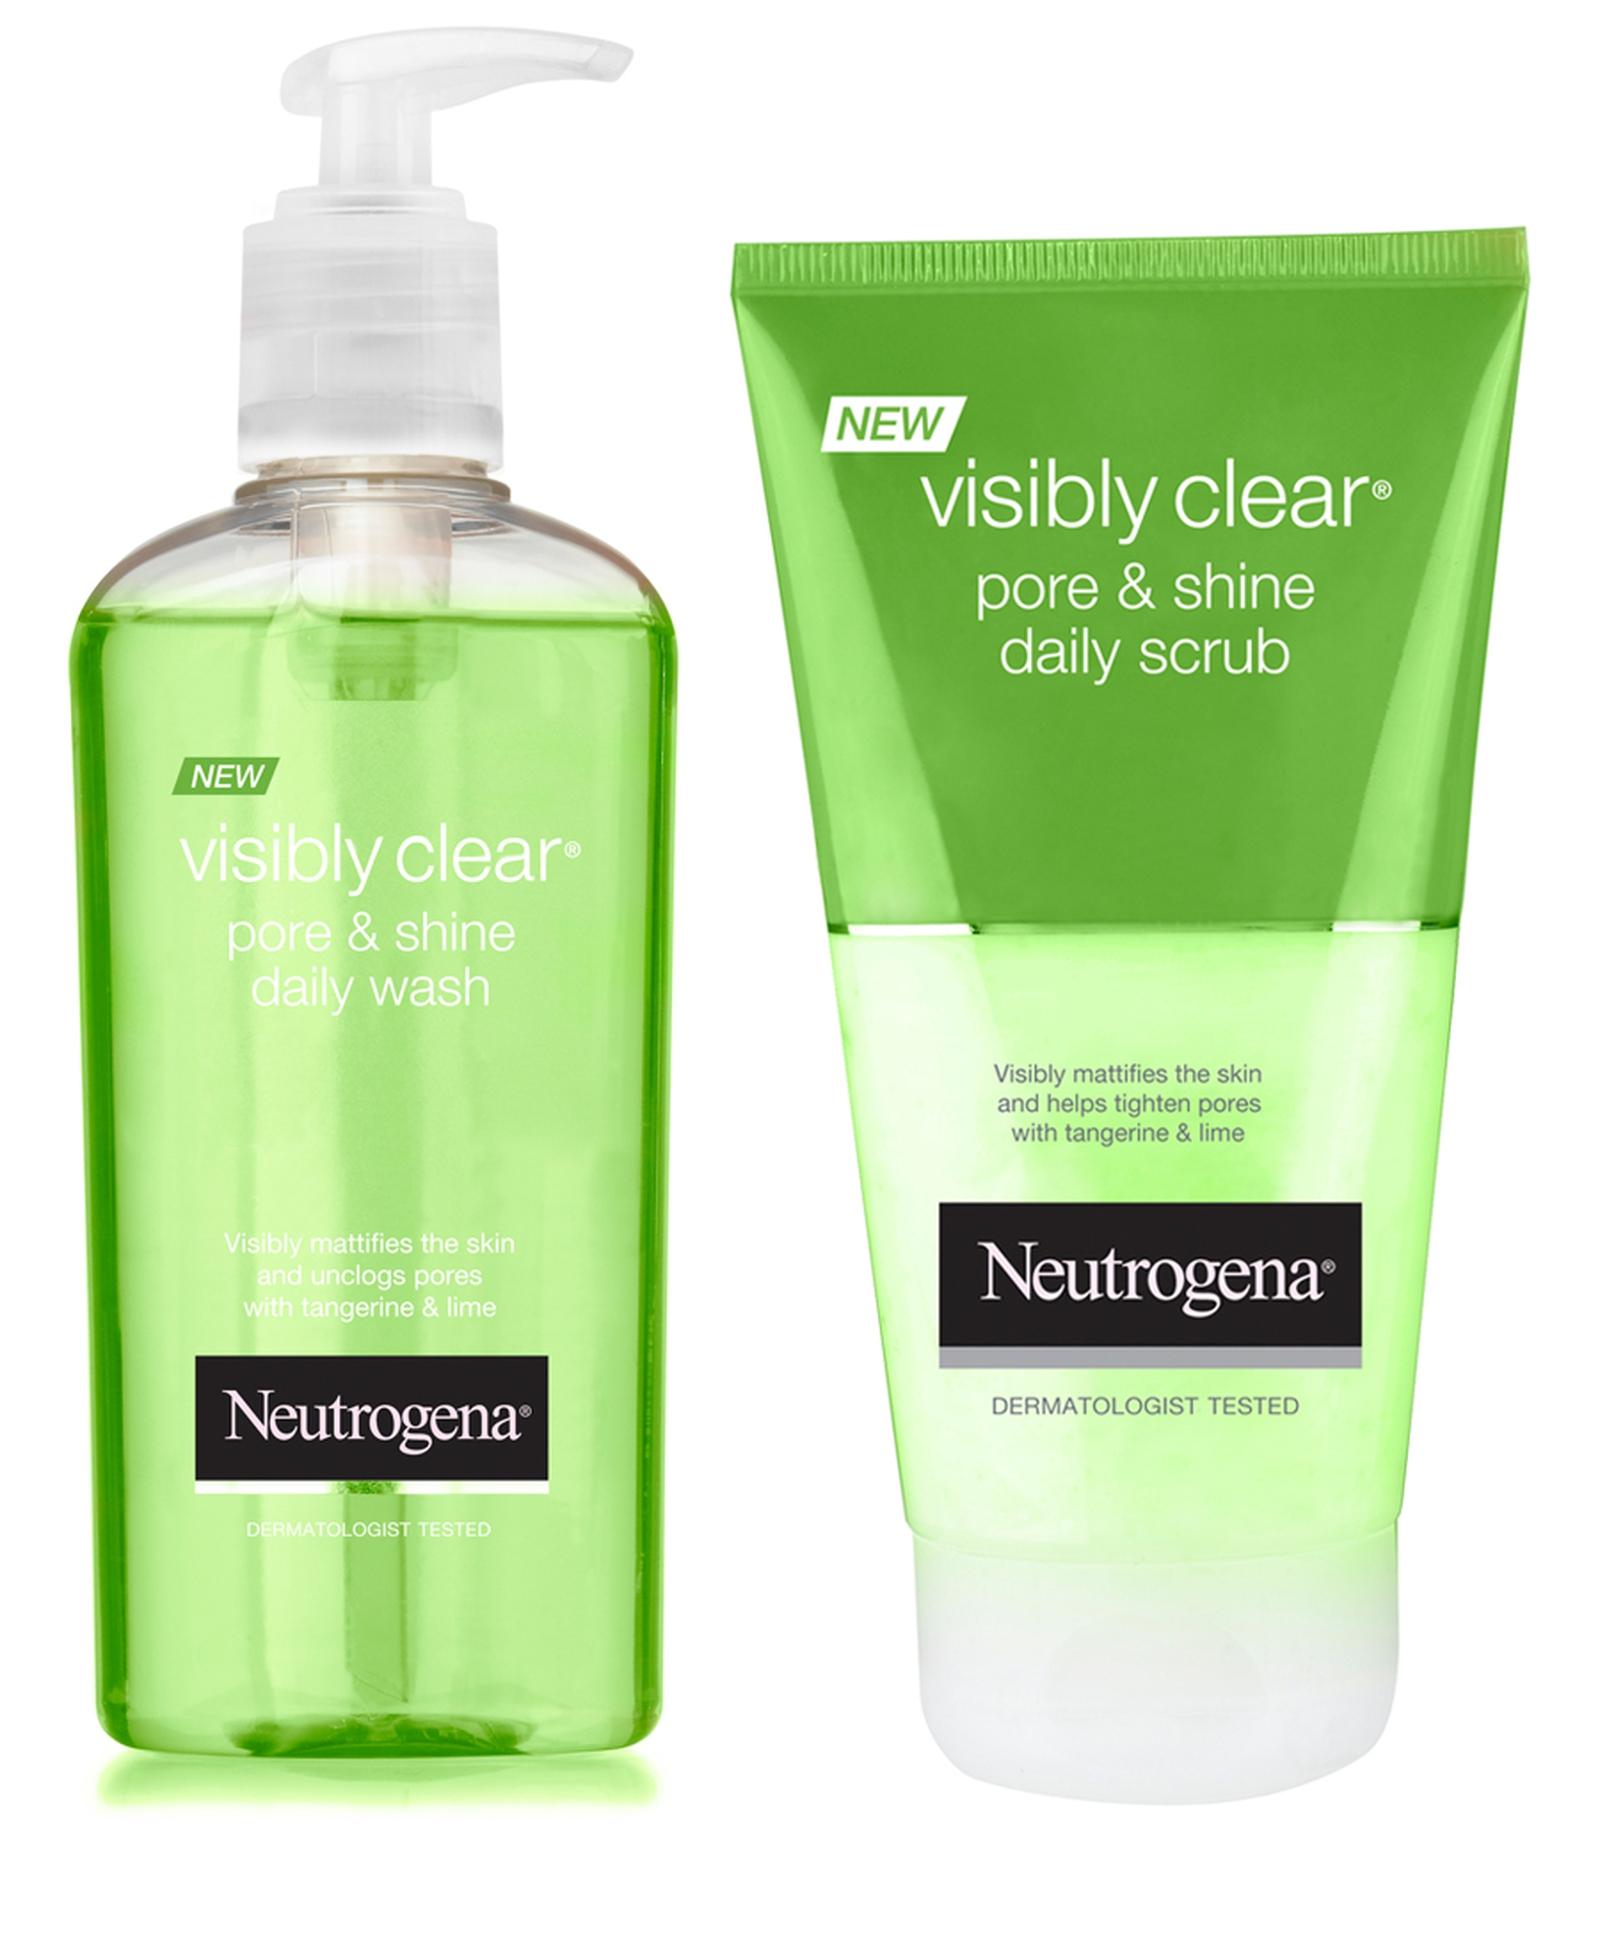 Neutrogena Visibly Clear Pore & Shine range